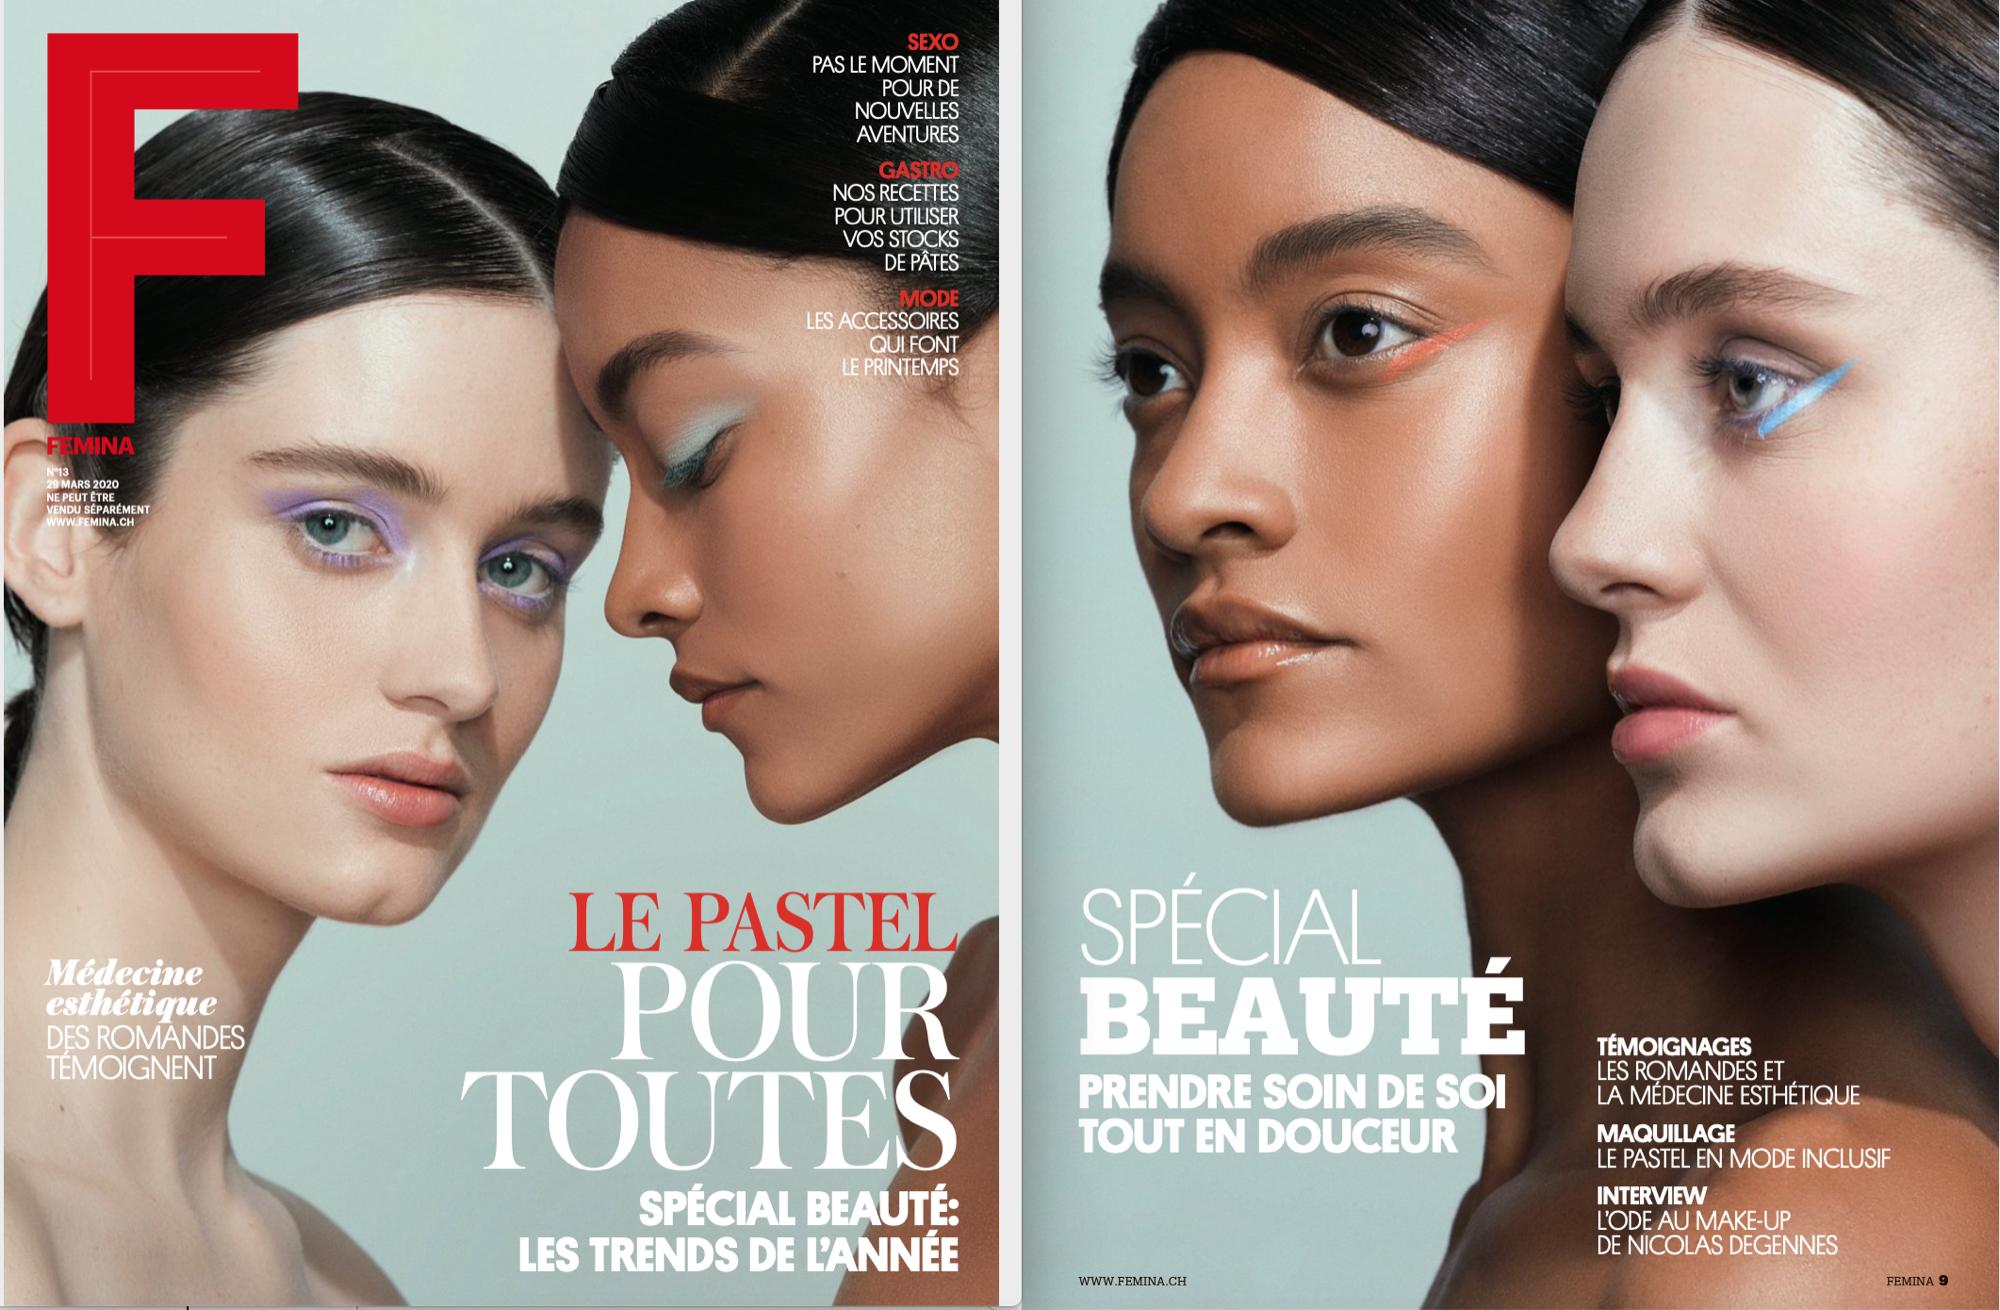 Bild zum Make up & Fashion Blog - beauty-editorial-von-juliette-f--r-femina-ID14576-01.png?v=1586269714